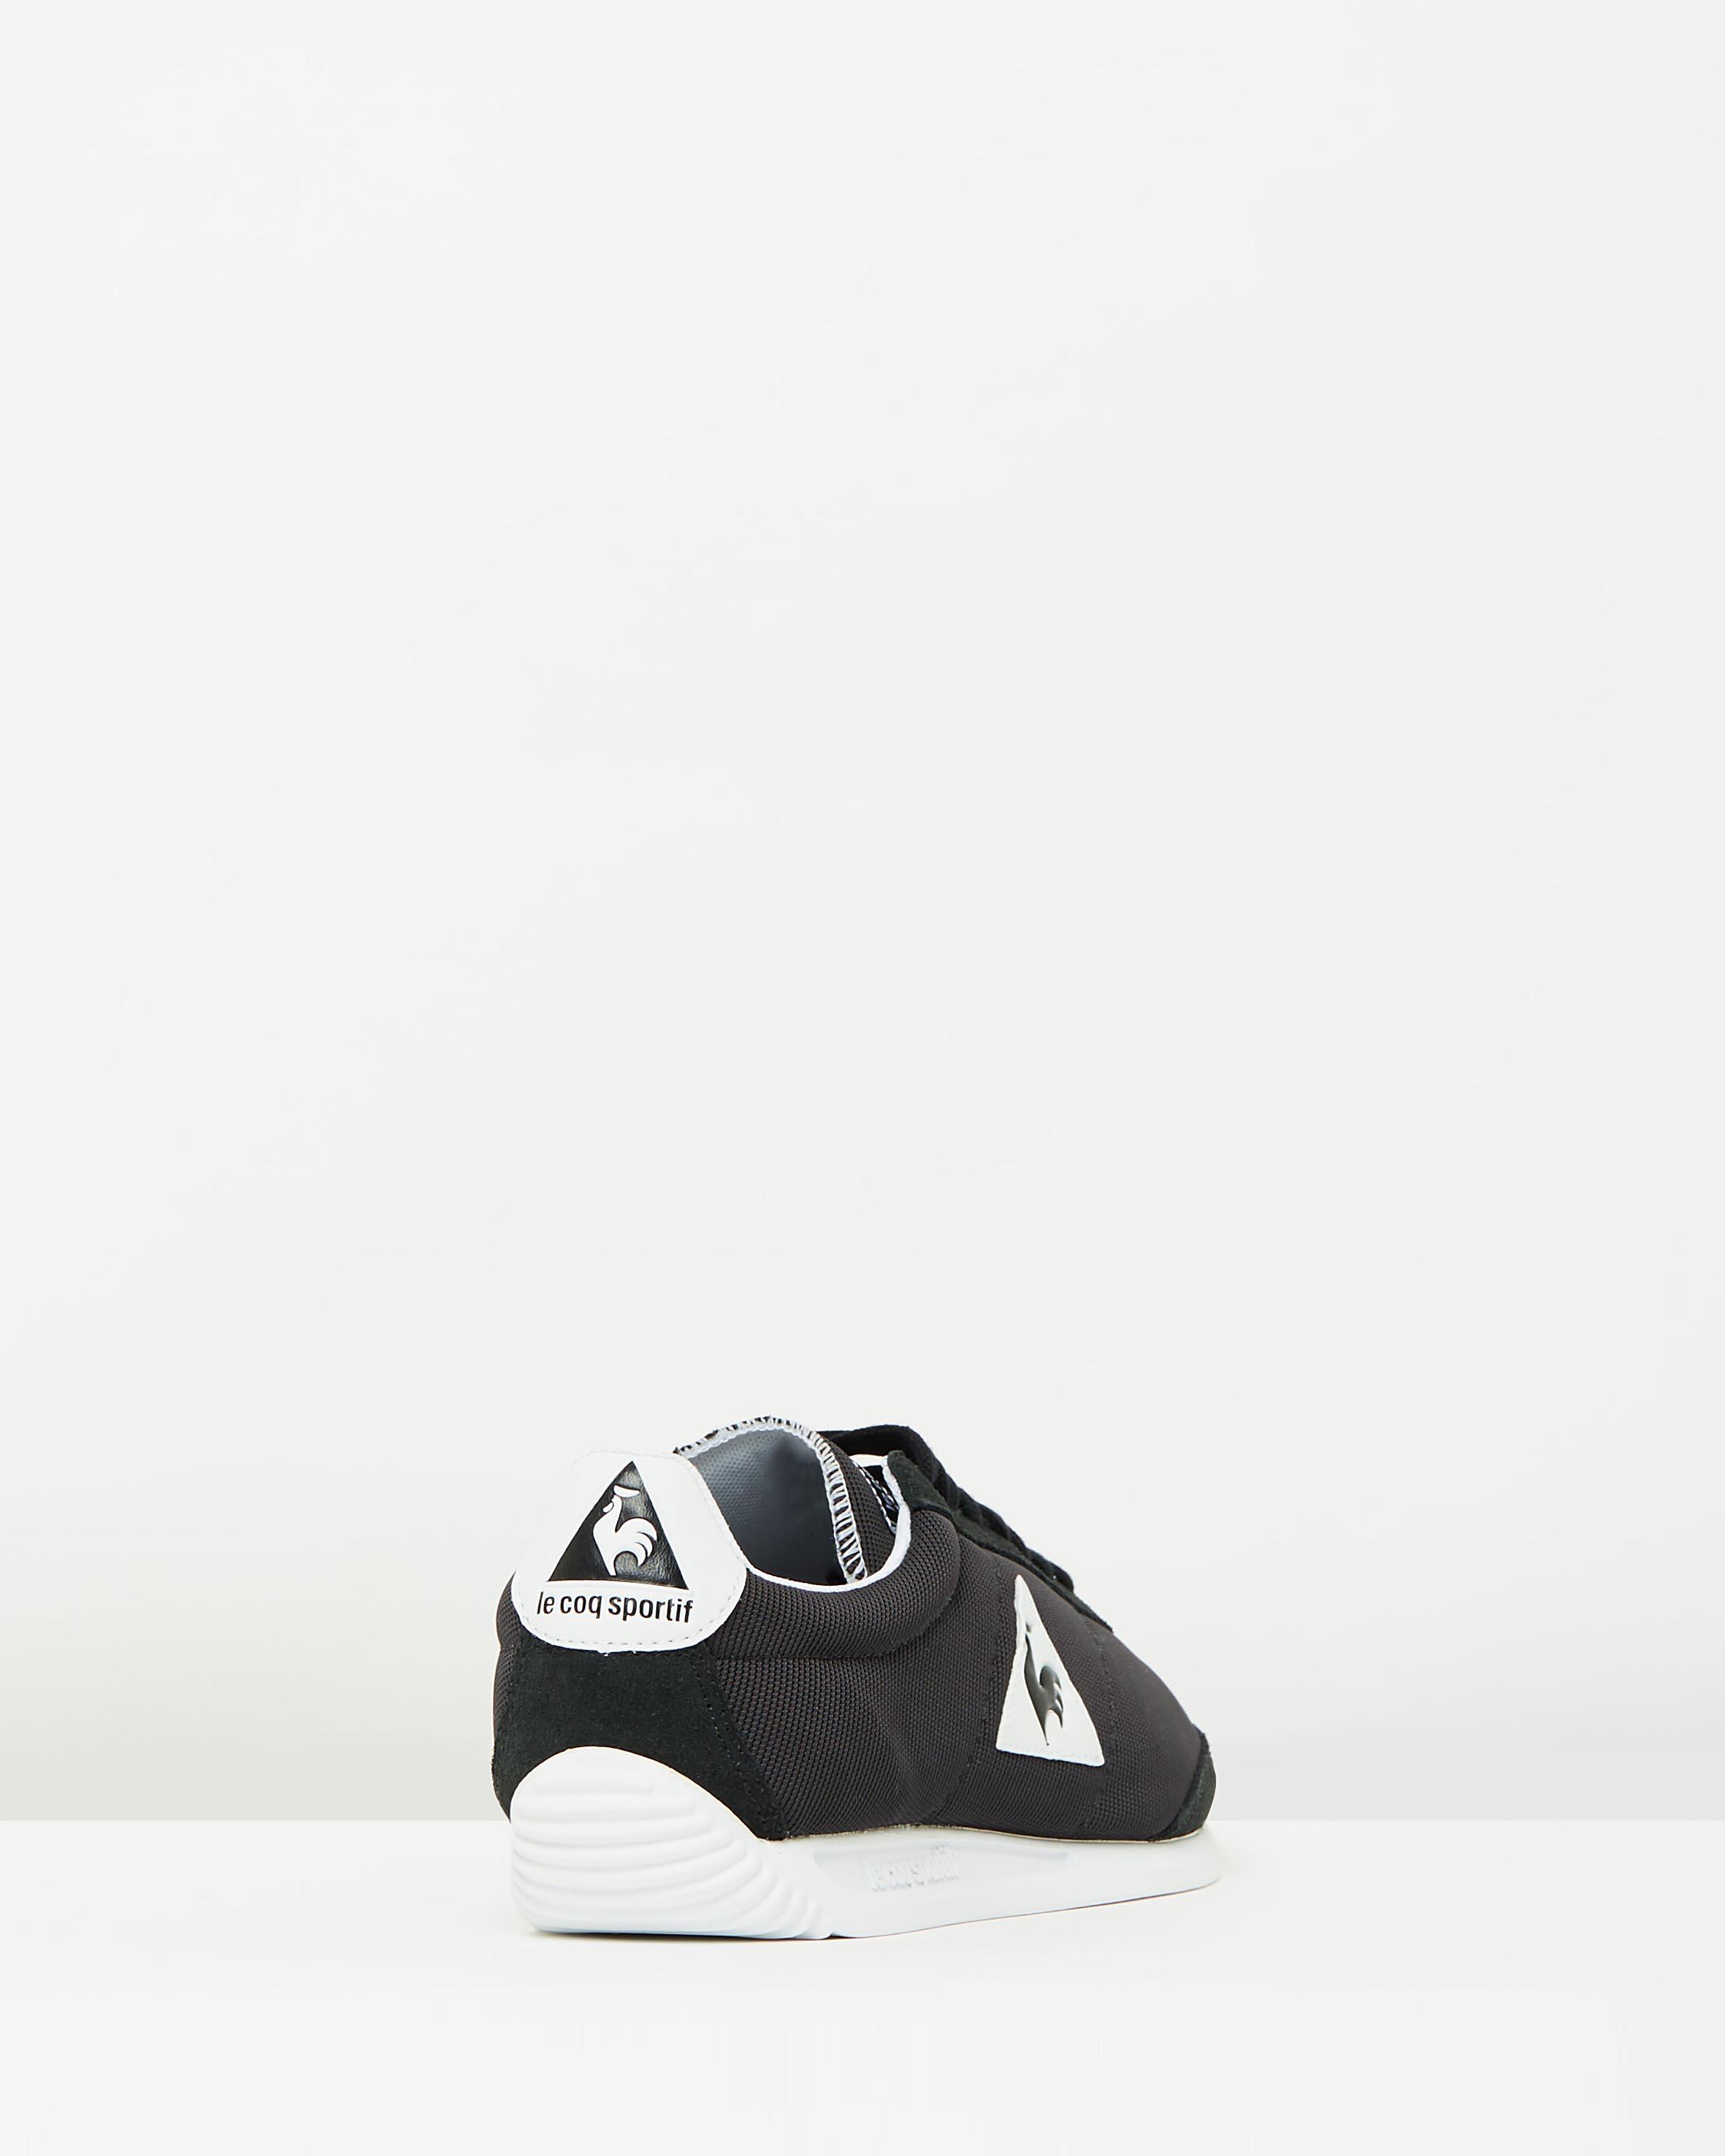 daf427ac5df4 ... Le Coq Sportif Quartz Nylon Sneakers Black 2 ...